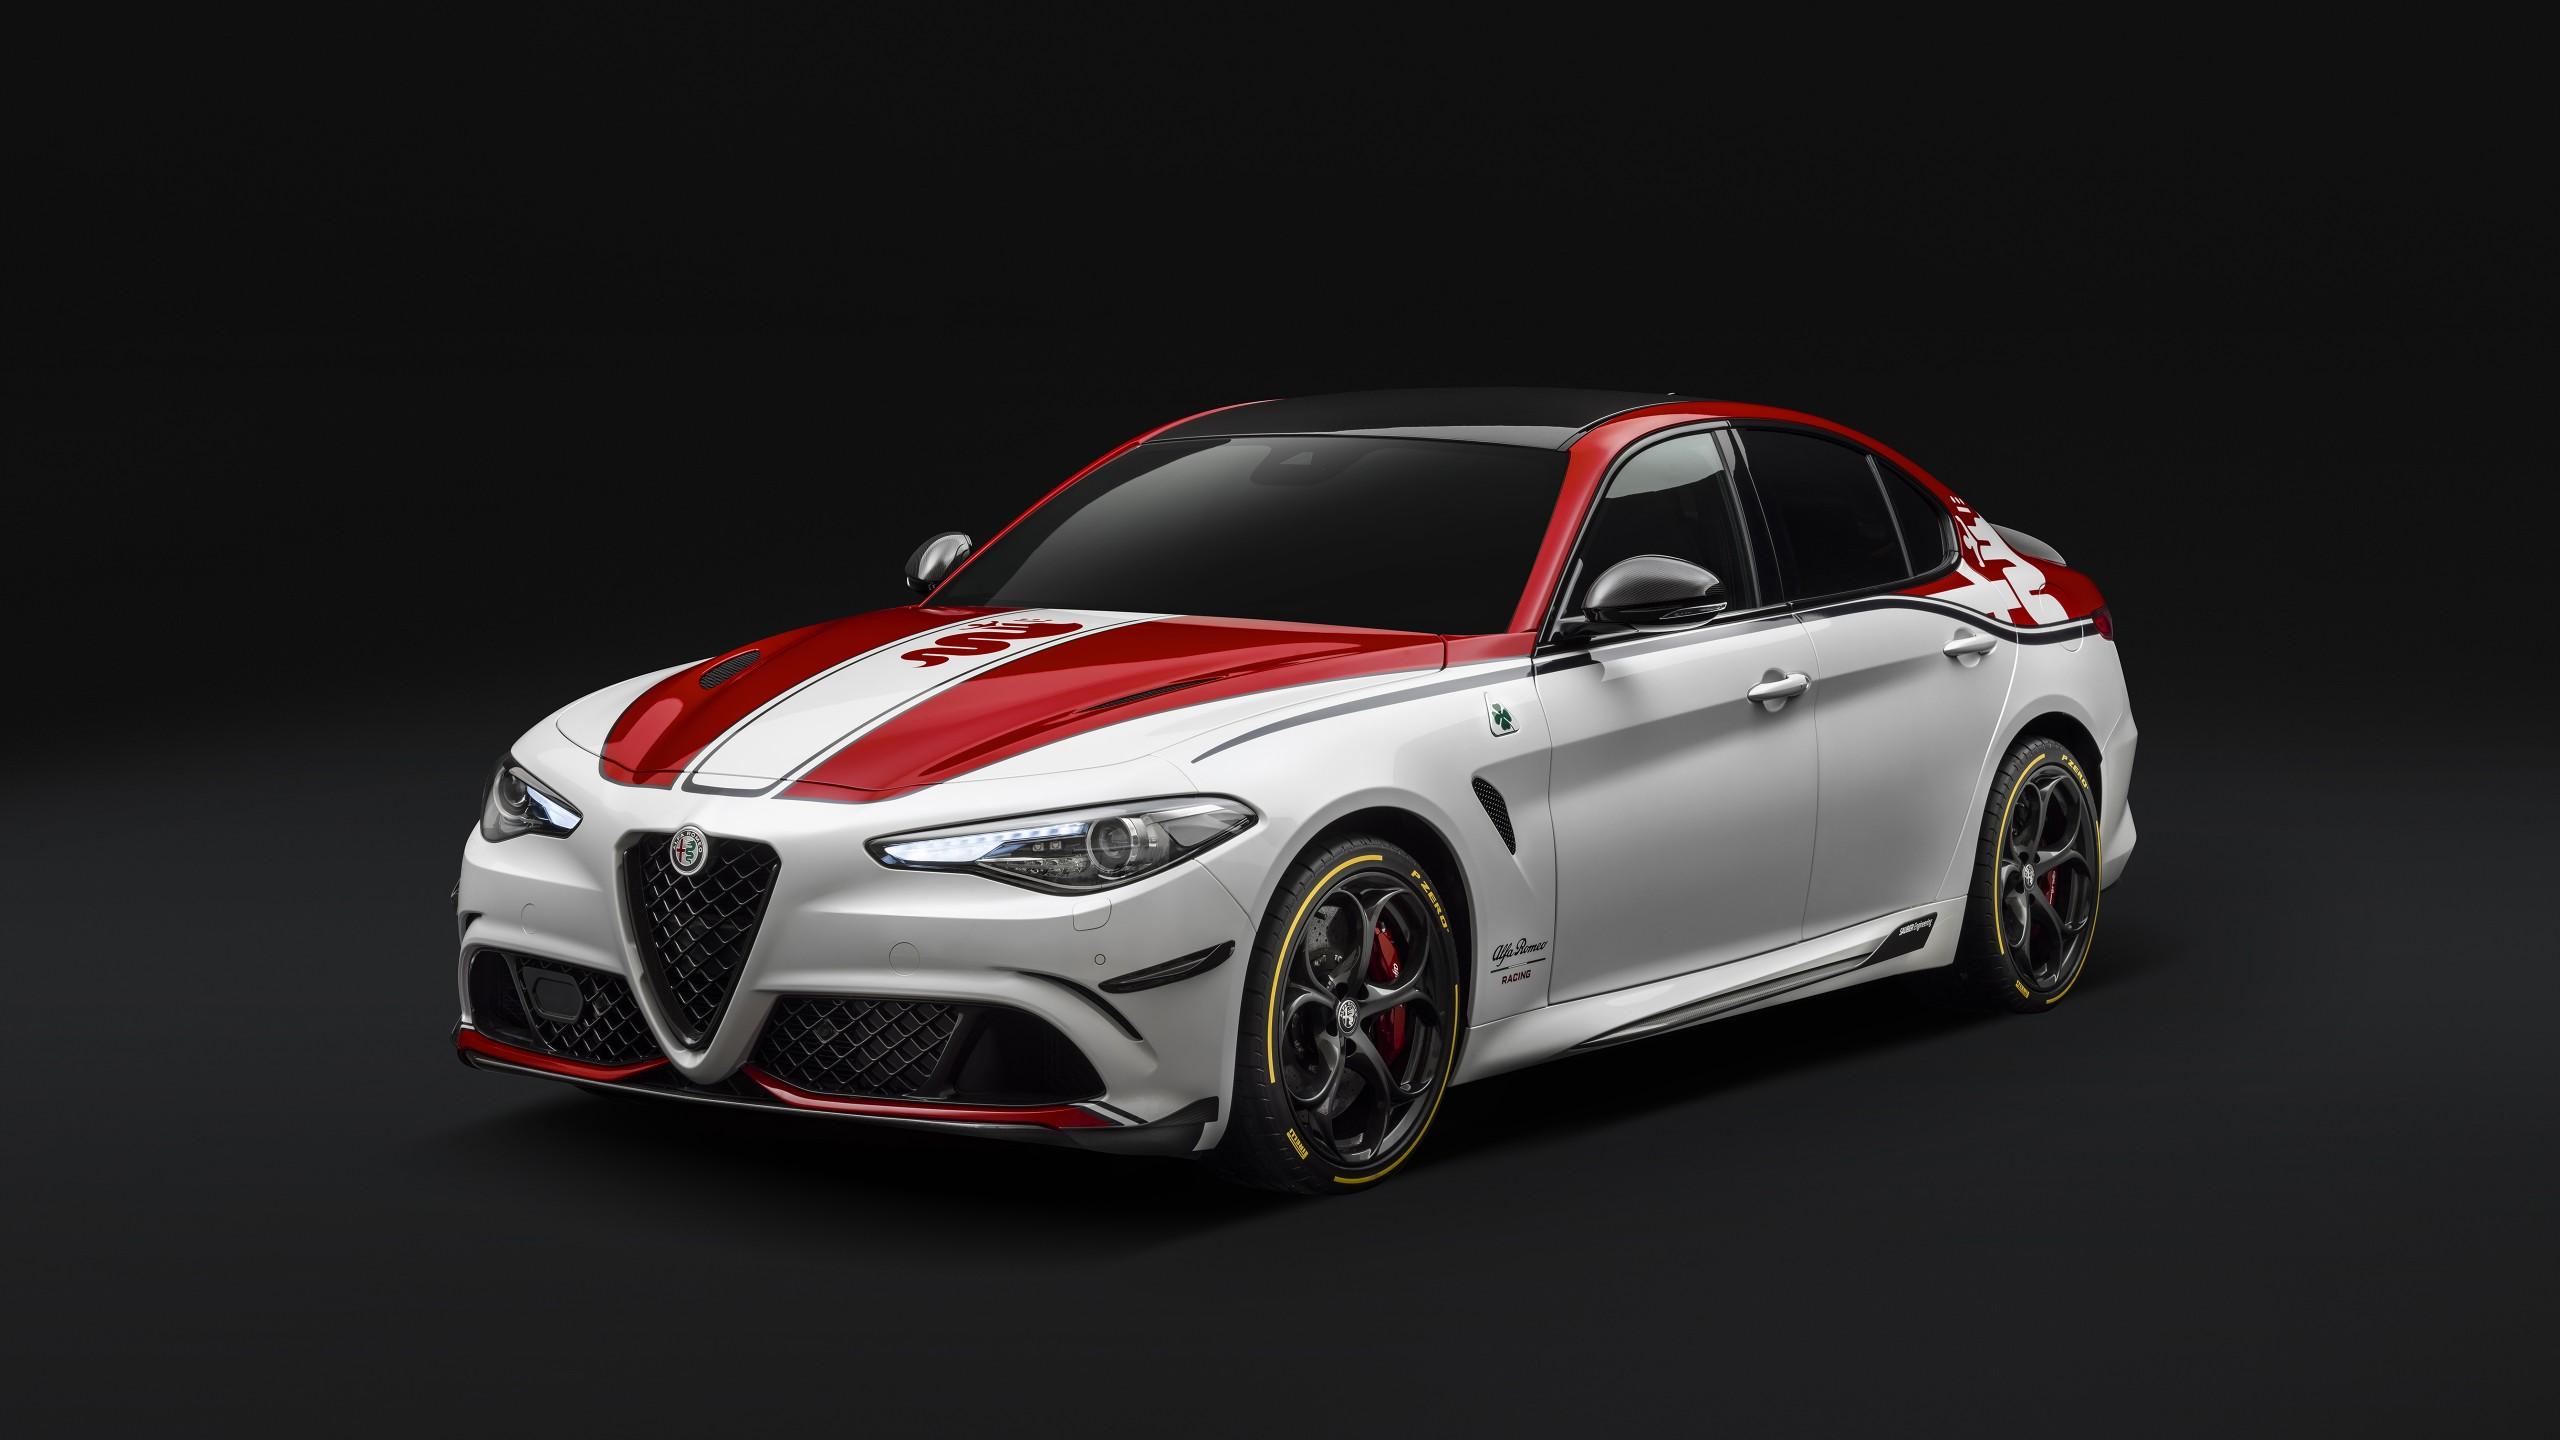 Cute Photography Wallpaper For Iphone Alfa Romeo Giulia Quadrifoglio Alfa Romeo Racing 2019 5k